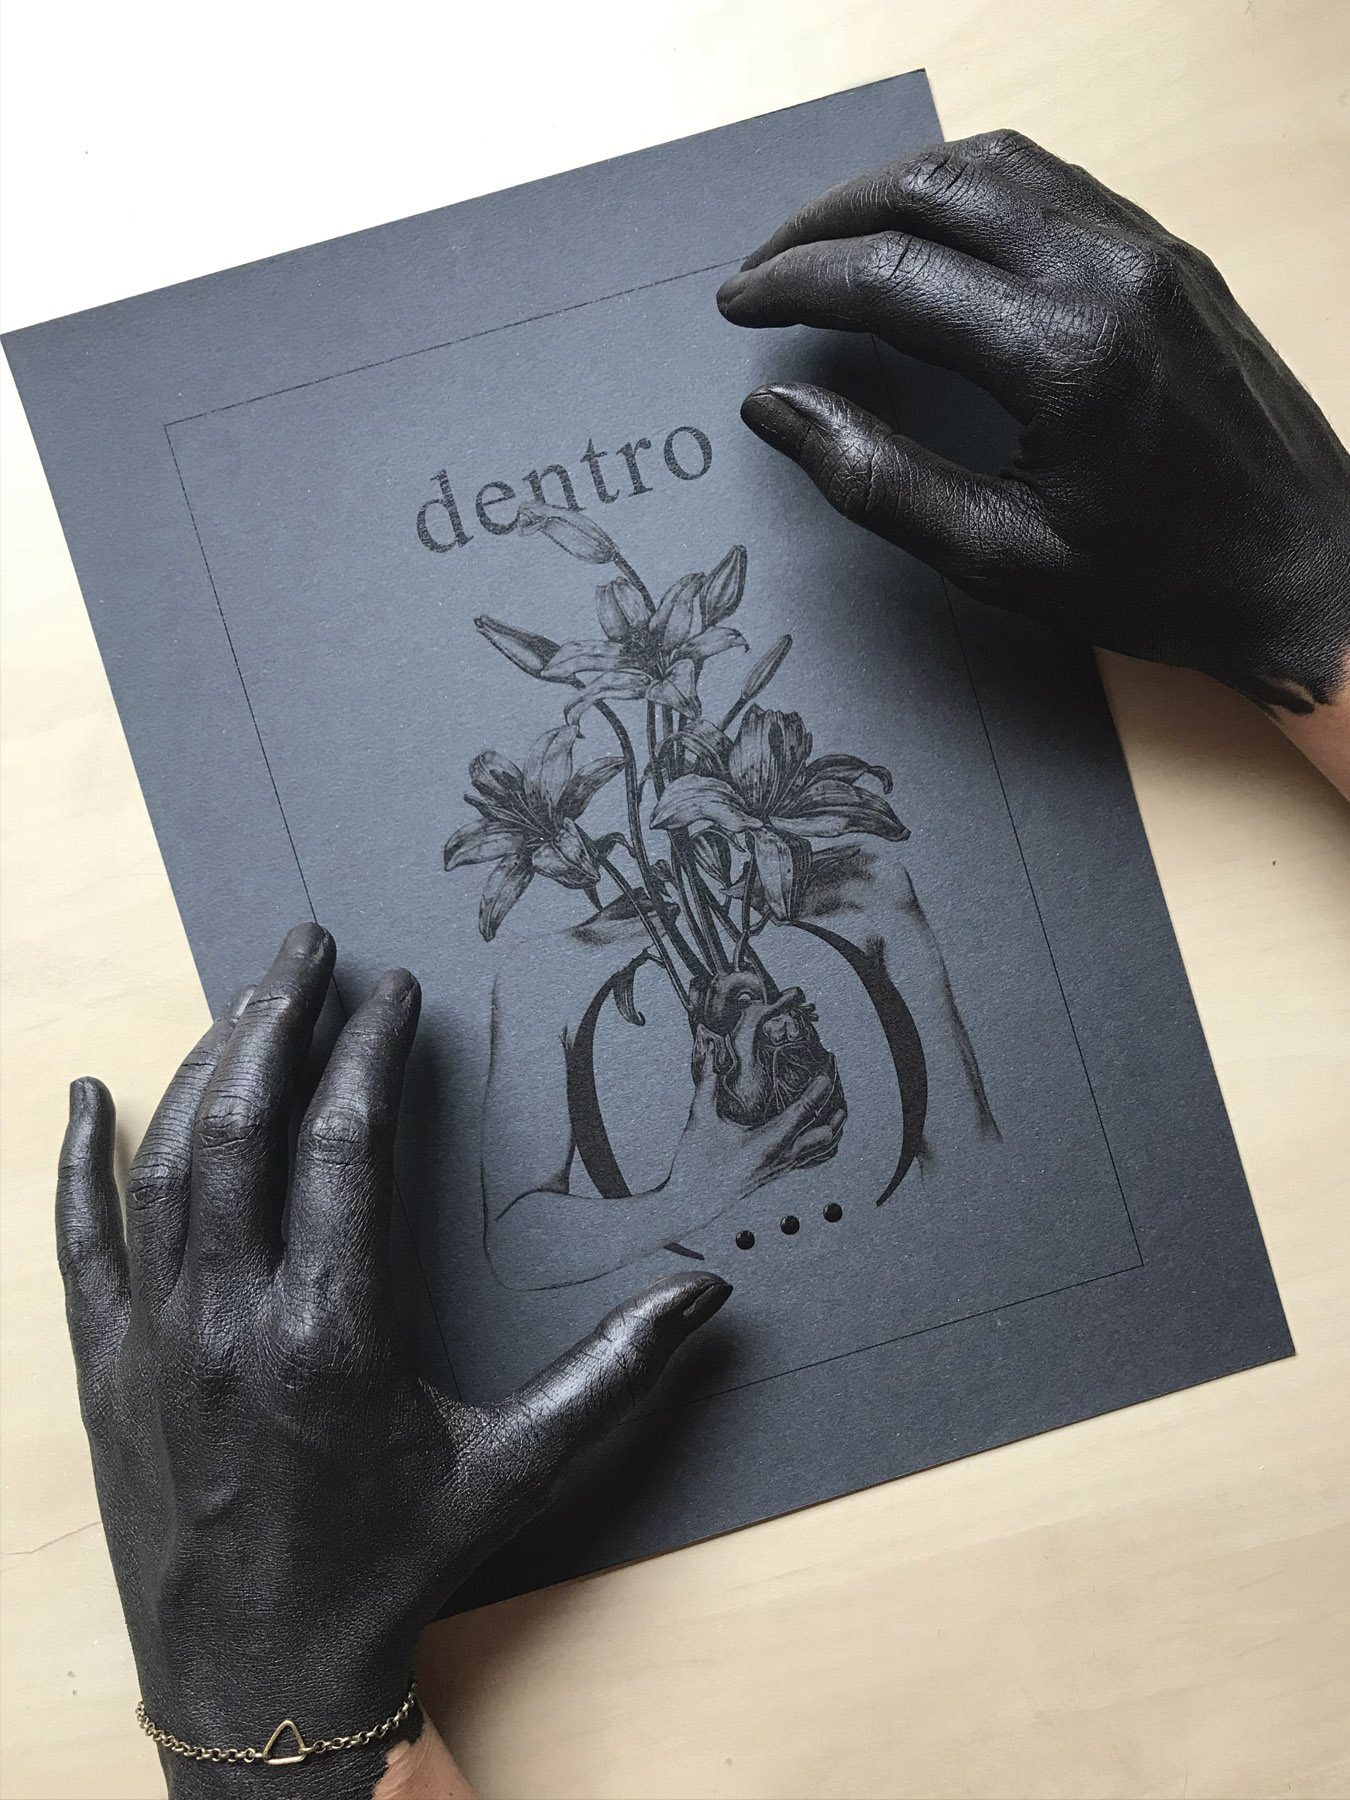 Ilustracion negra poetica y conceptual hecha por giselle vitali